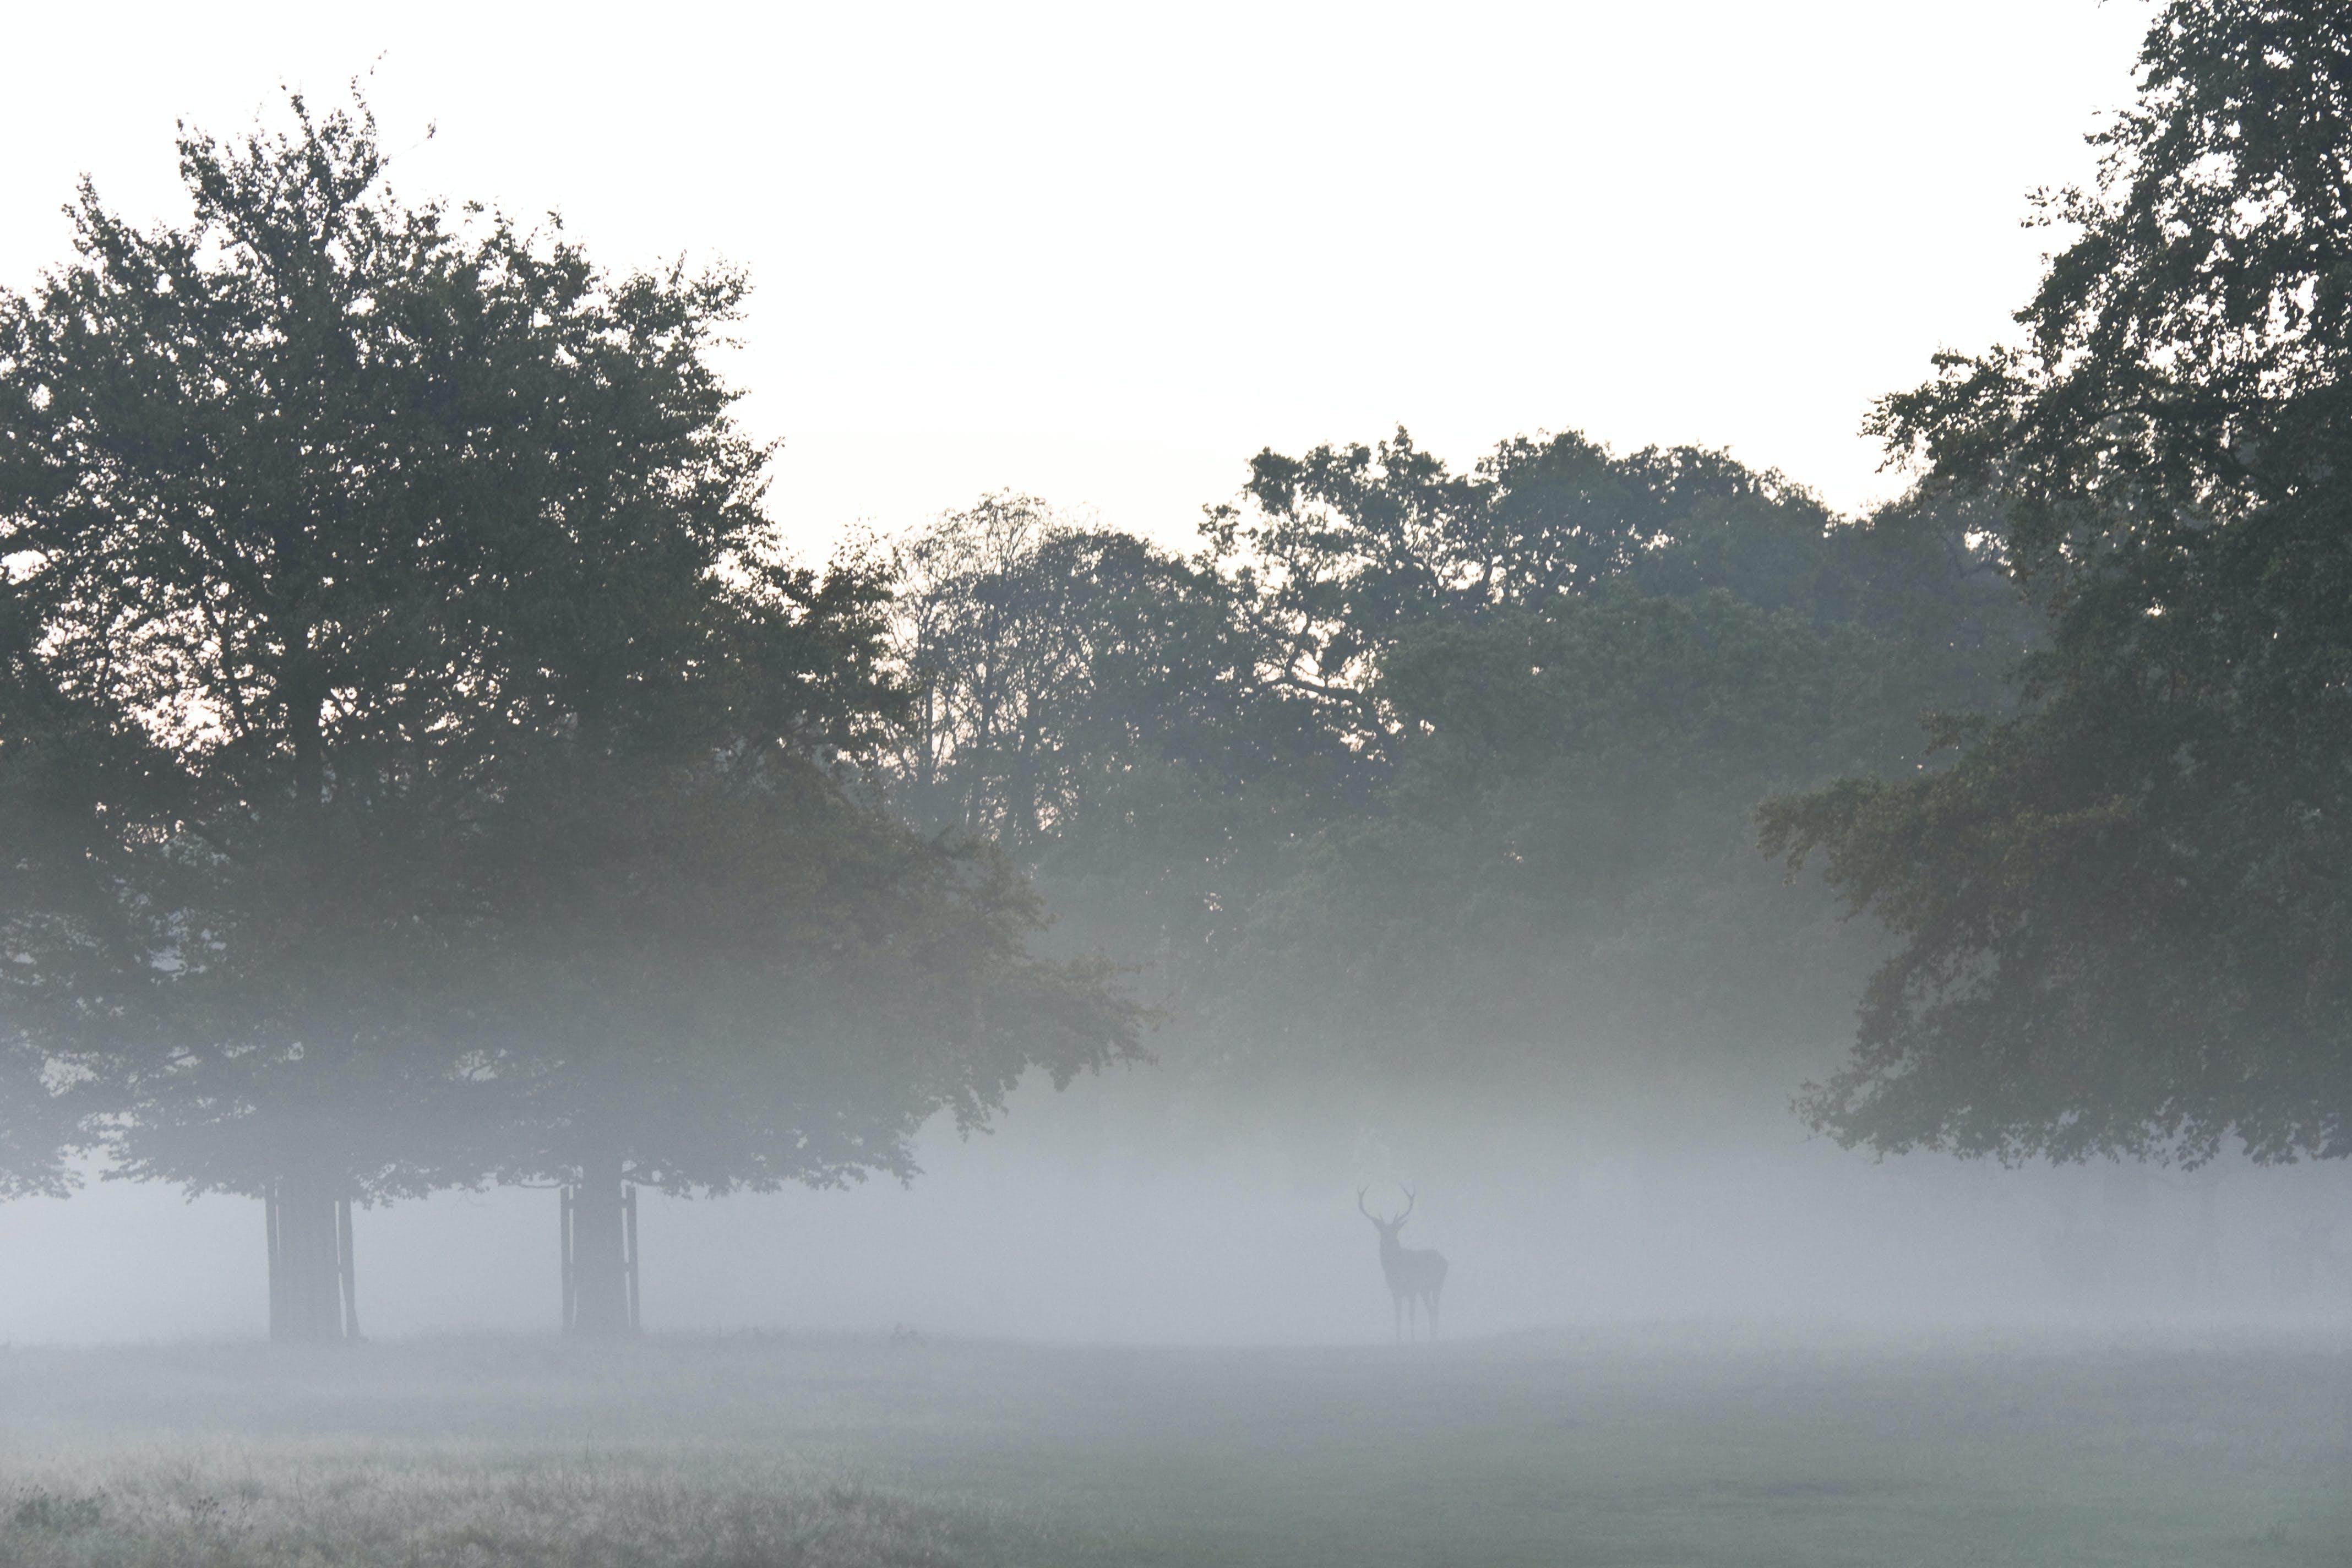 Photo of a Buck Beside Trees